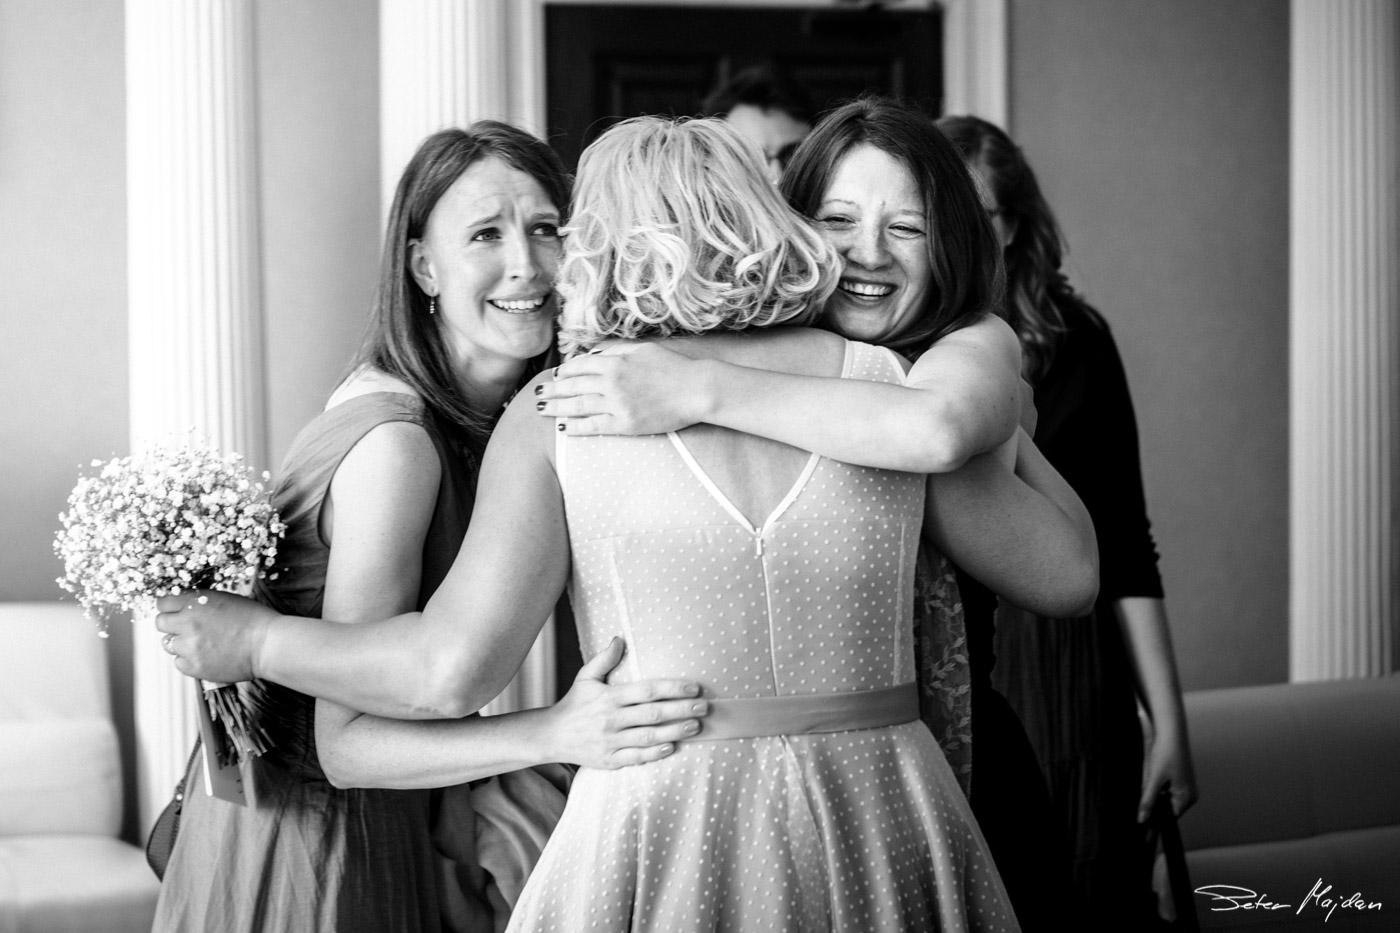 Colwick-hall-wedding-photography-26.jpg